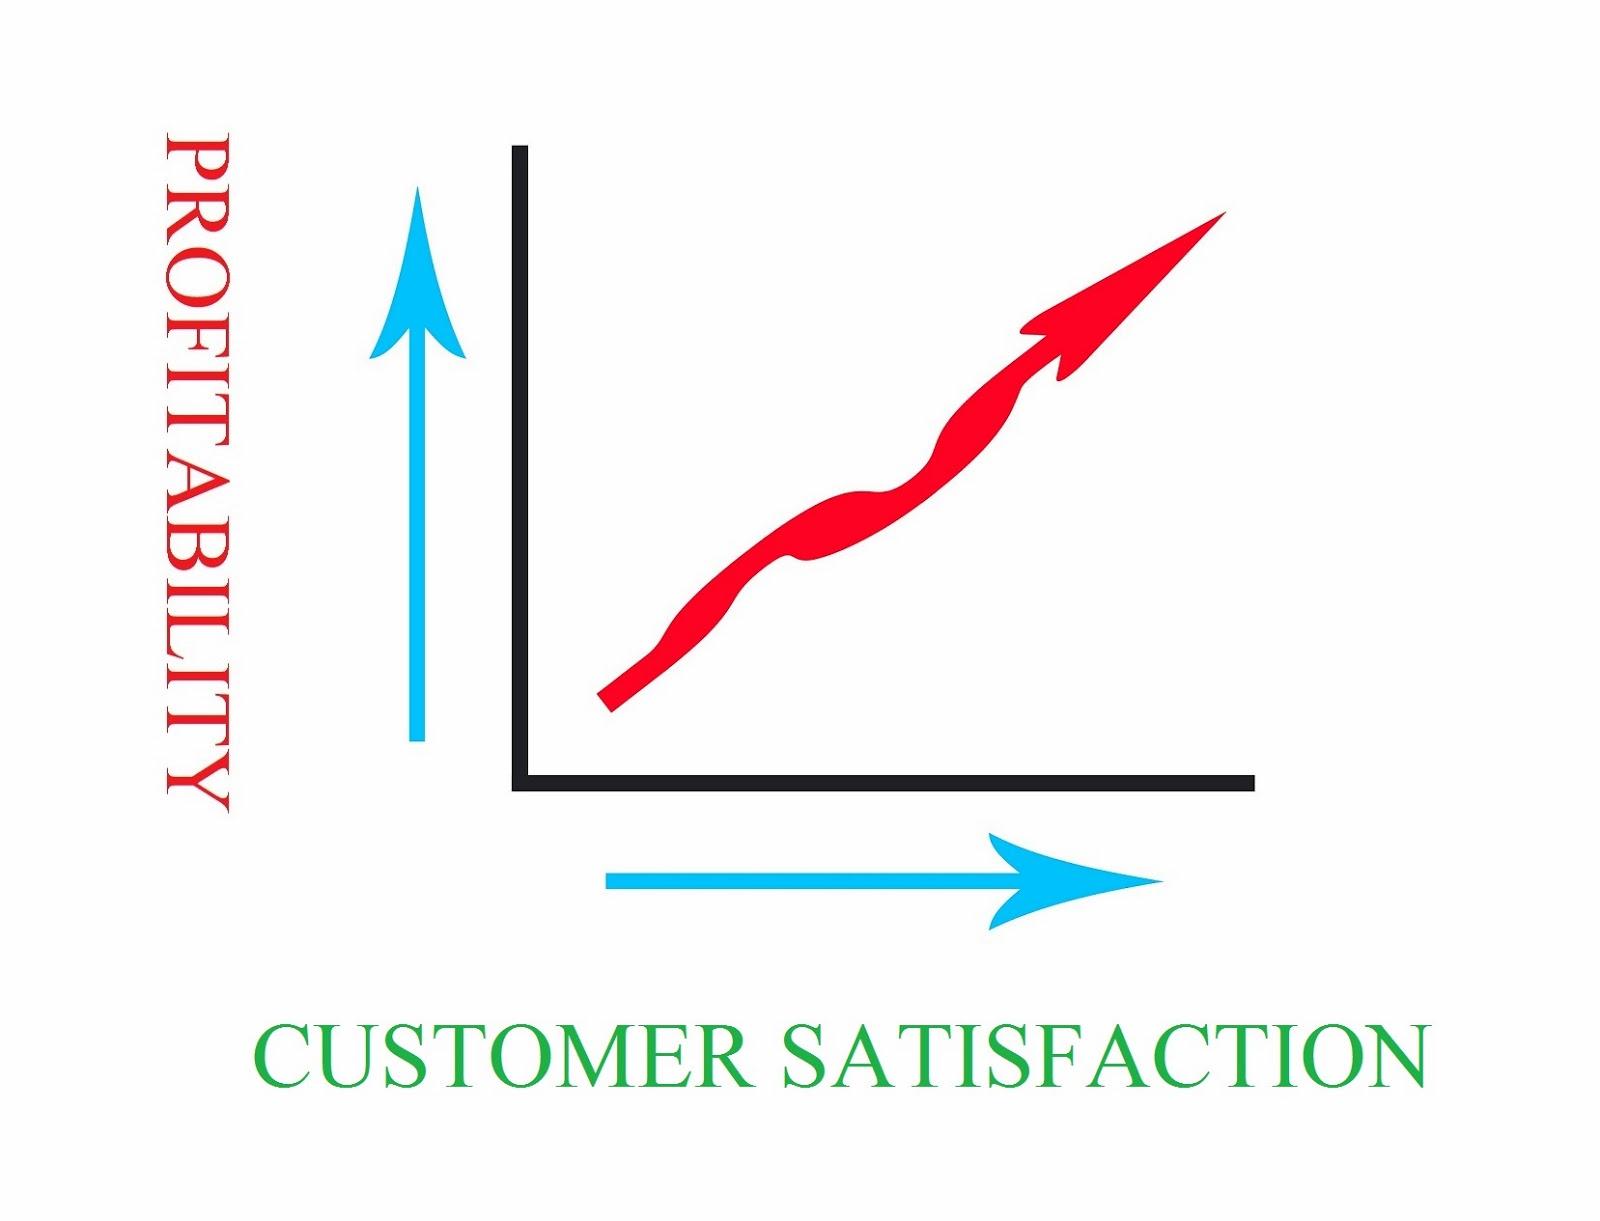 improving customer satisfaction Business process mapping: improving customer satisfaction: j mike jacka, paulette j keller: 9780470444580: books - amazonca.